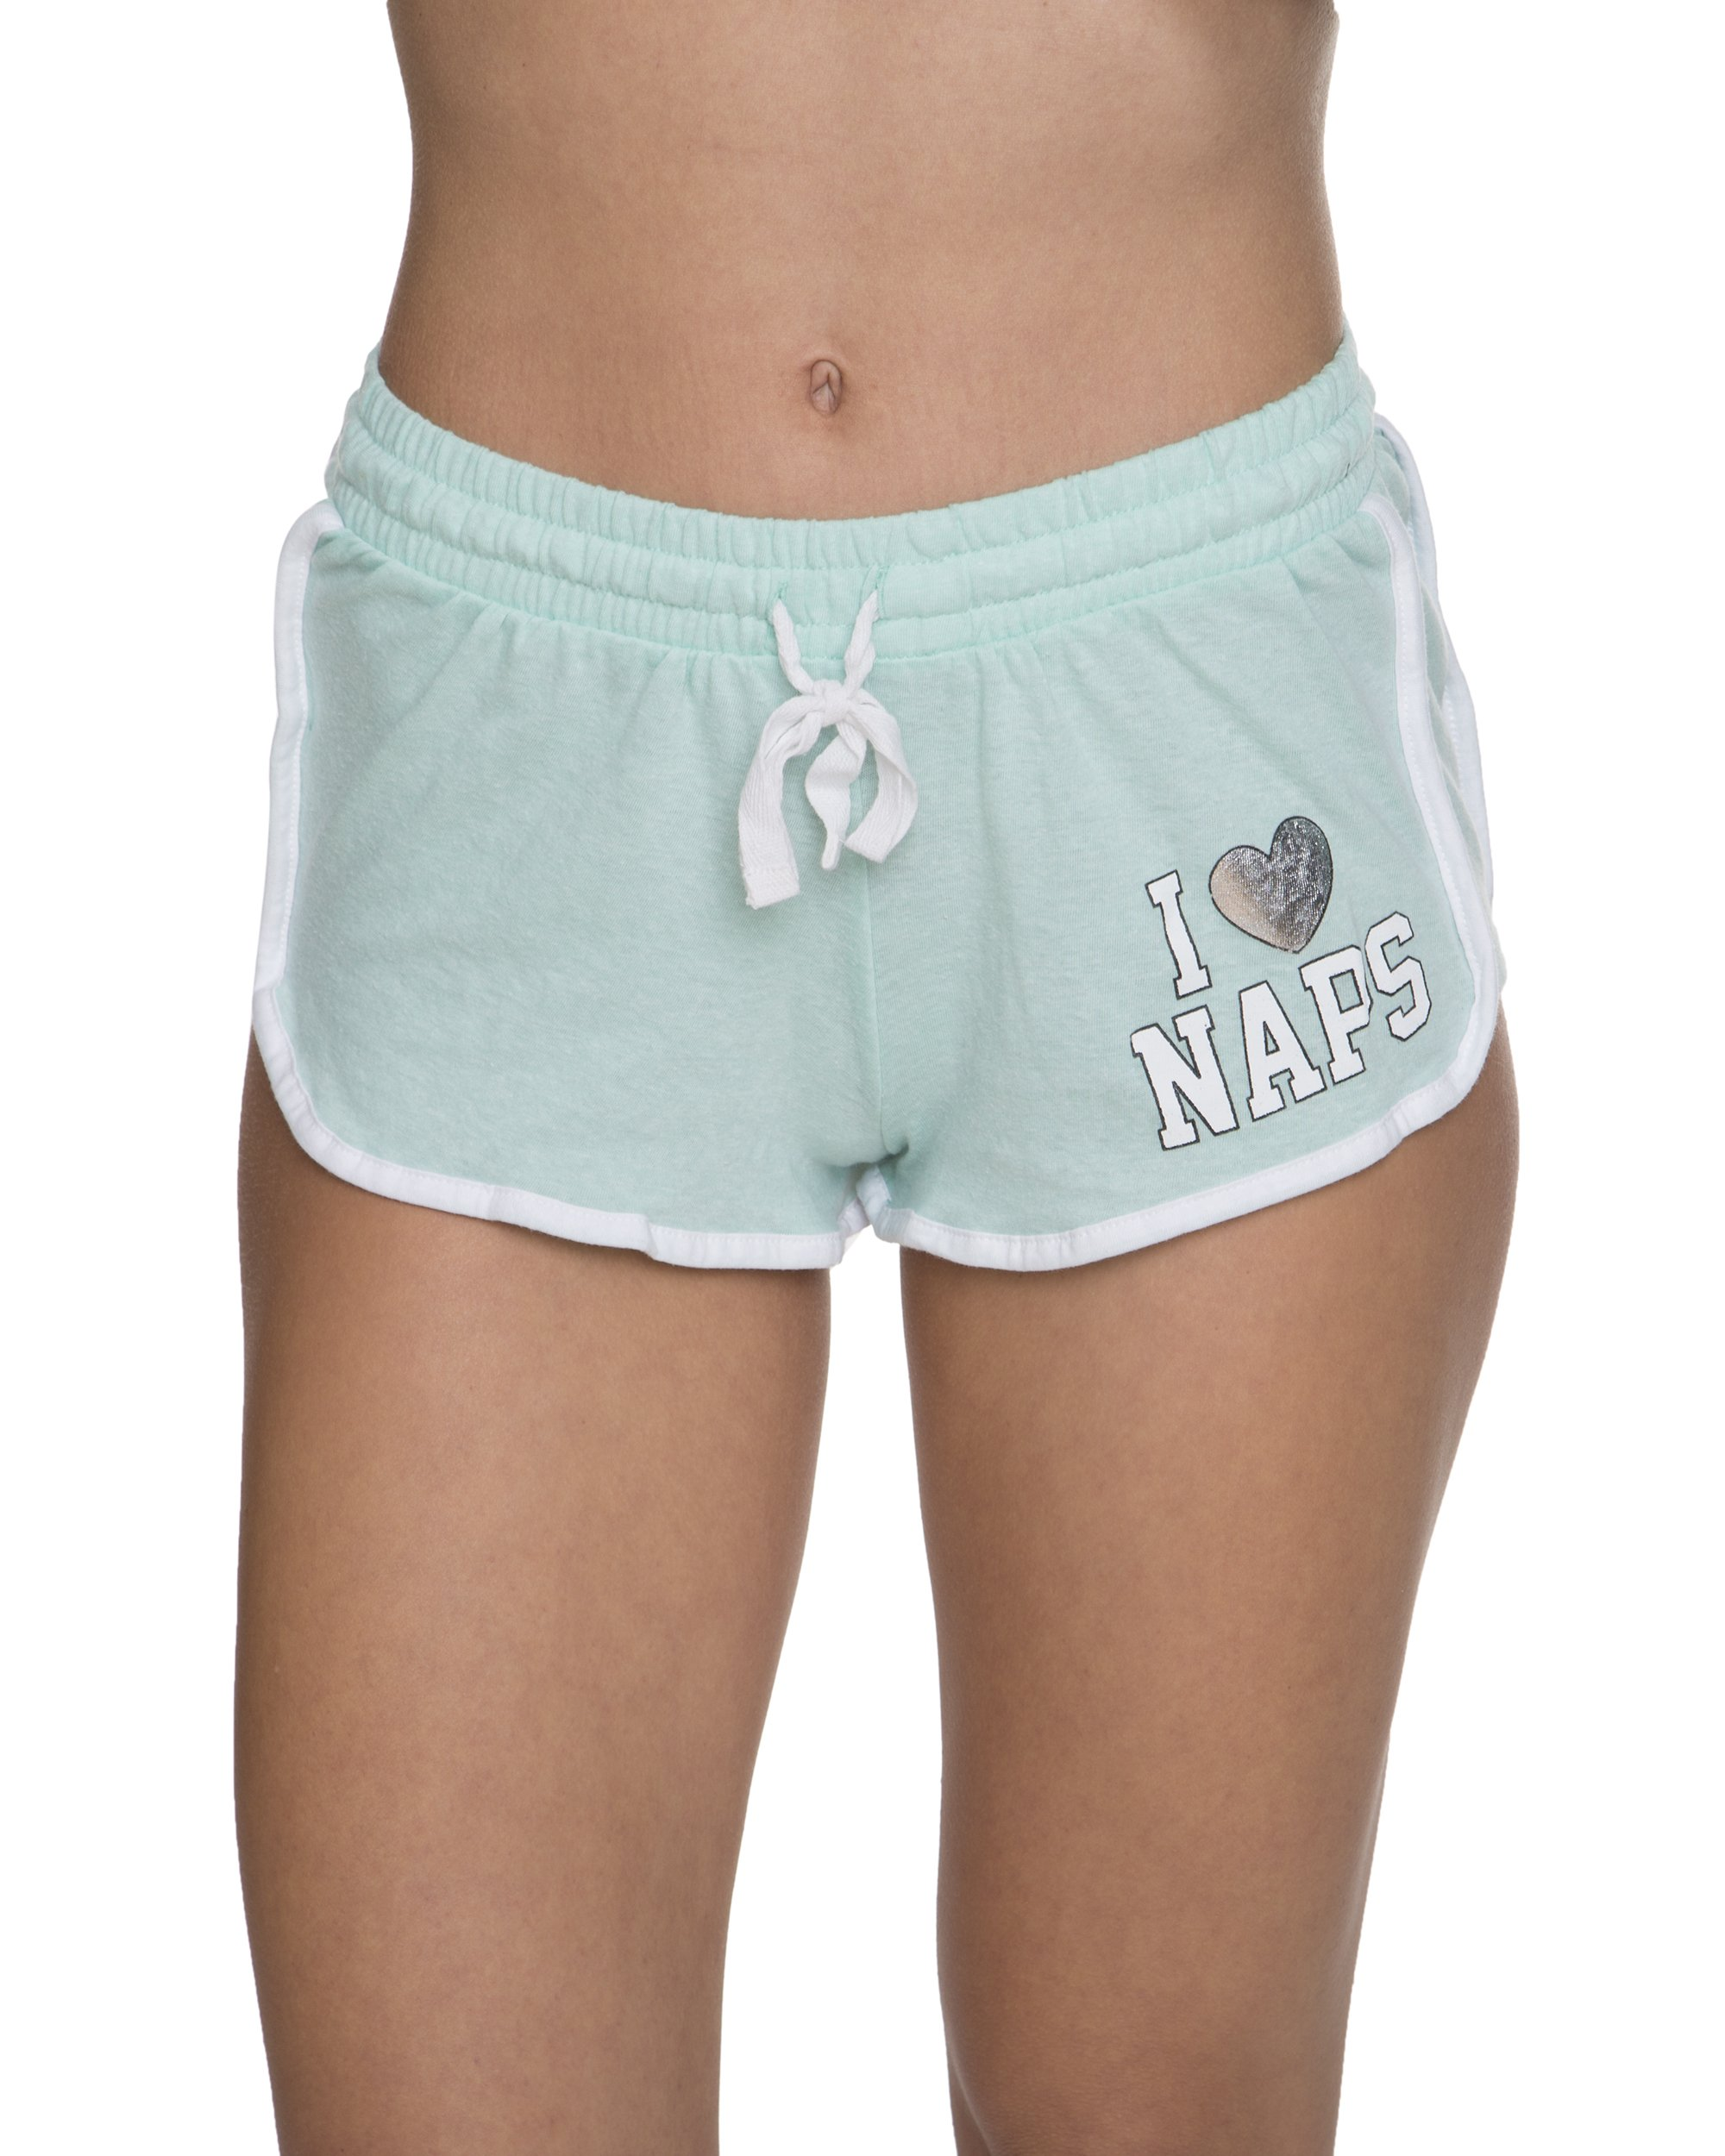 Sleep & Co. Womens Pajama Sleepwear Varsity Shorts with Naps Graphic Mint Heather Medium